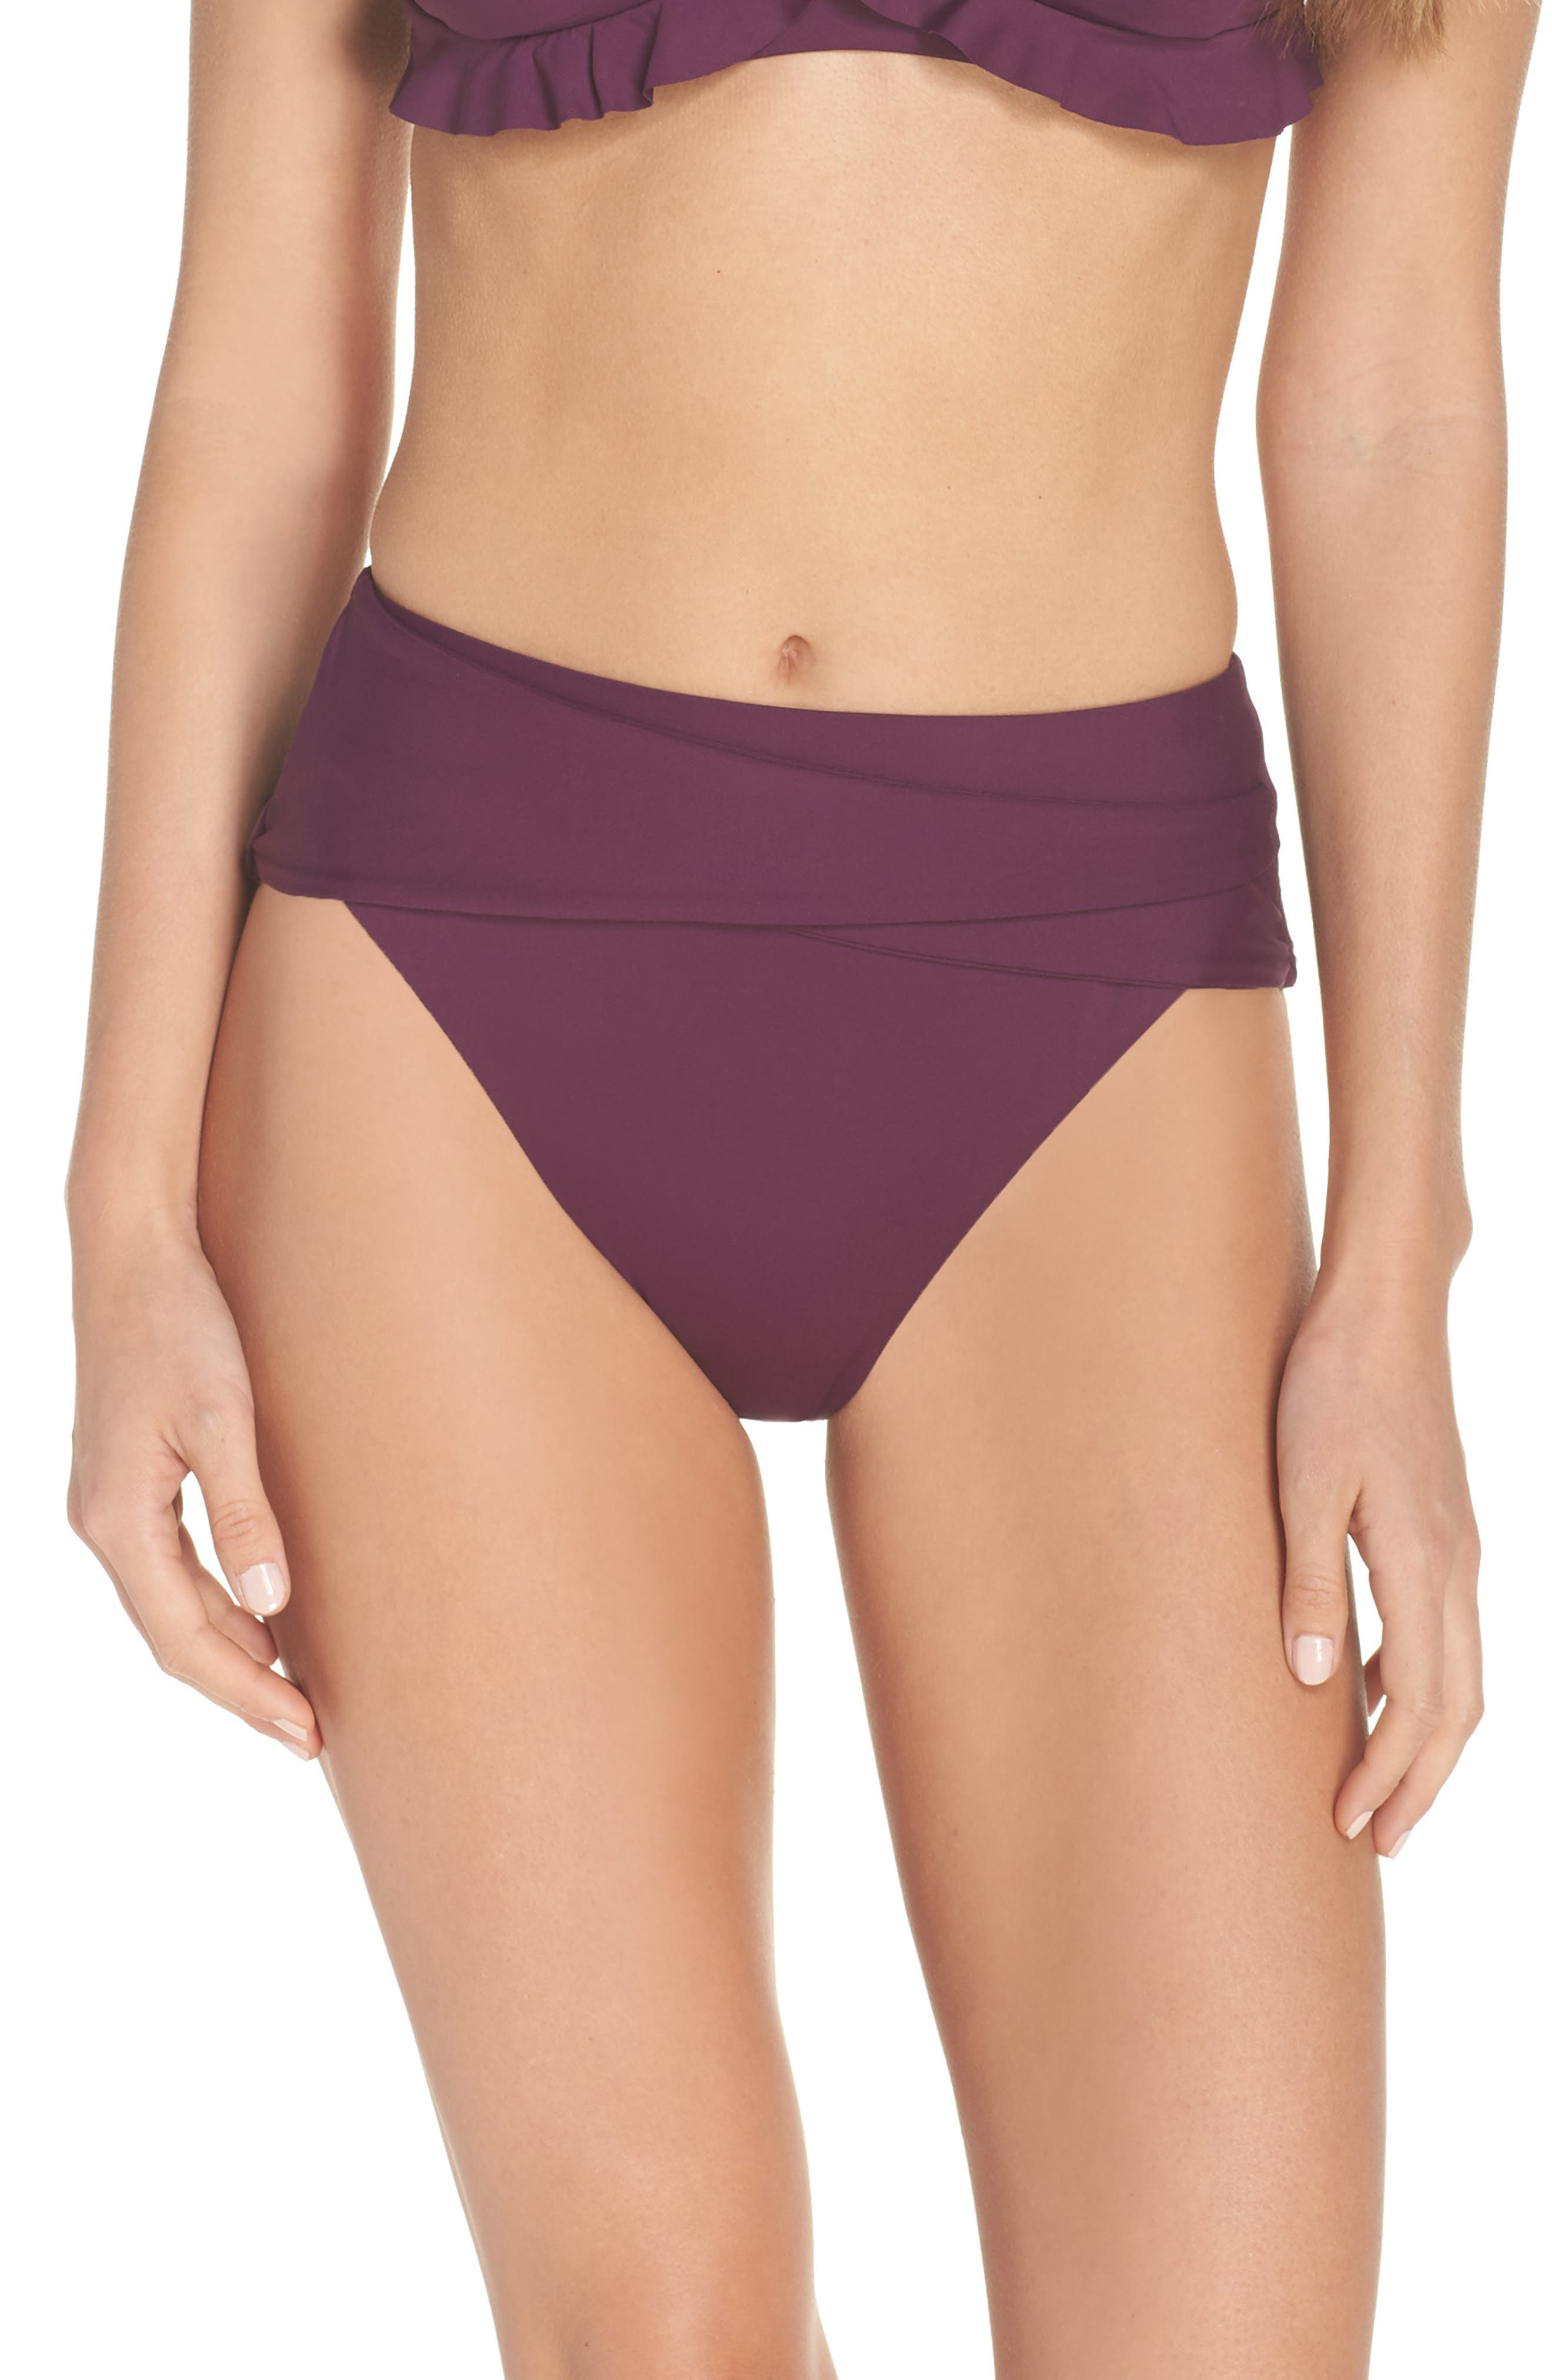 BECCA, Color Code Crossover High Waist Bikini Bottoms, Main thumbnail 1, color, MERLOT